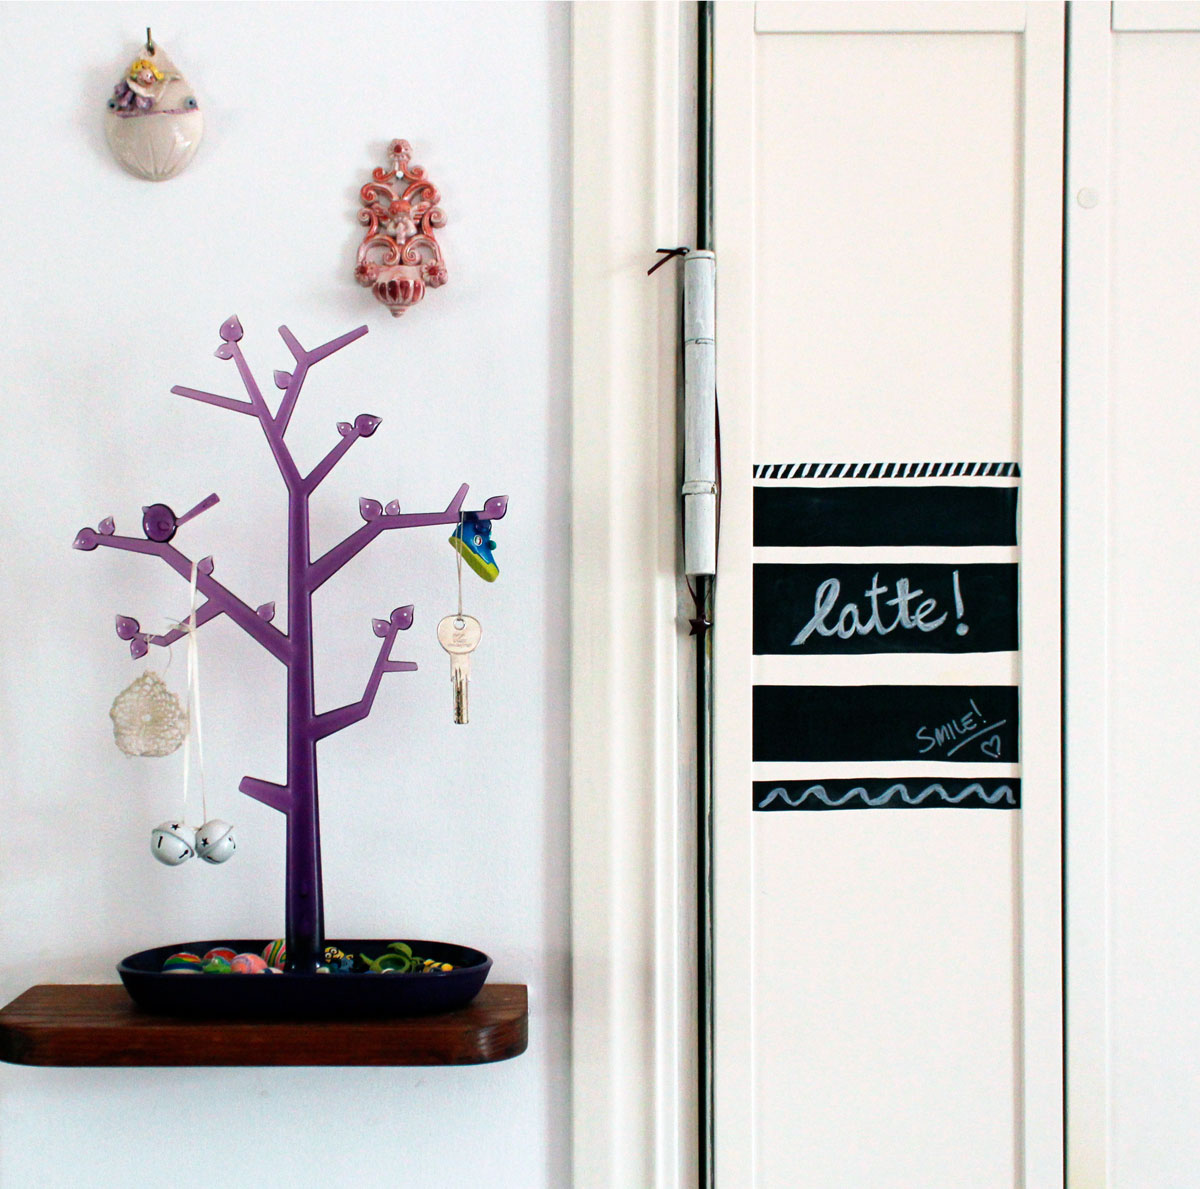 dettaglio porta ingresso